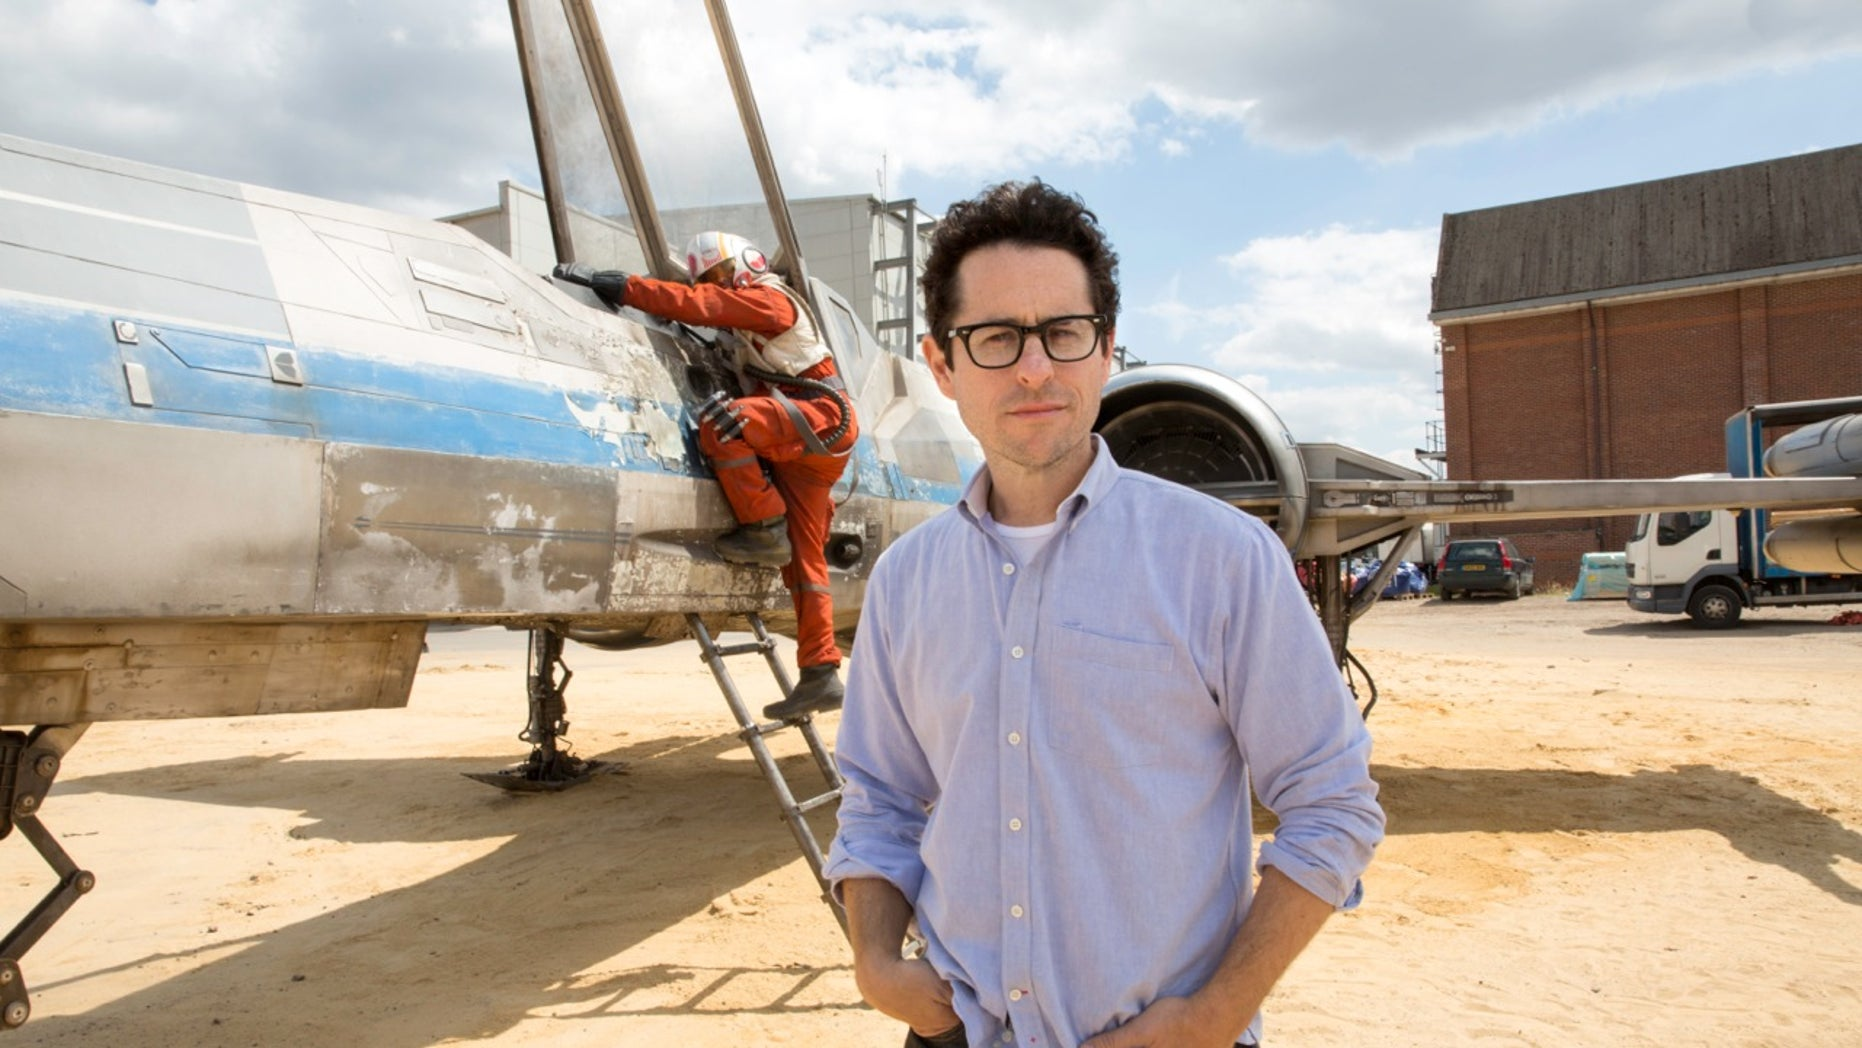 J.J. Abrams and Star Wars